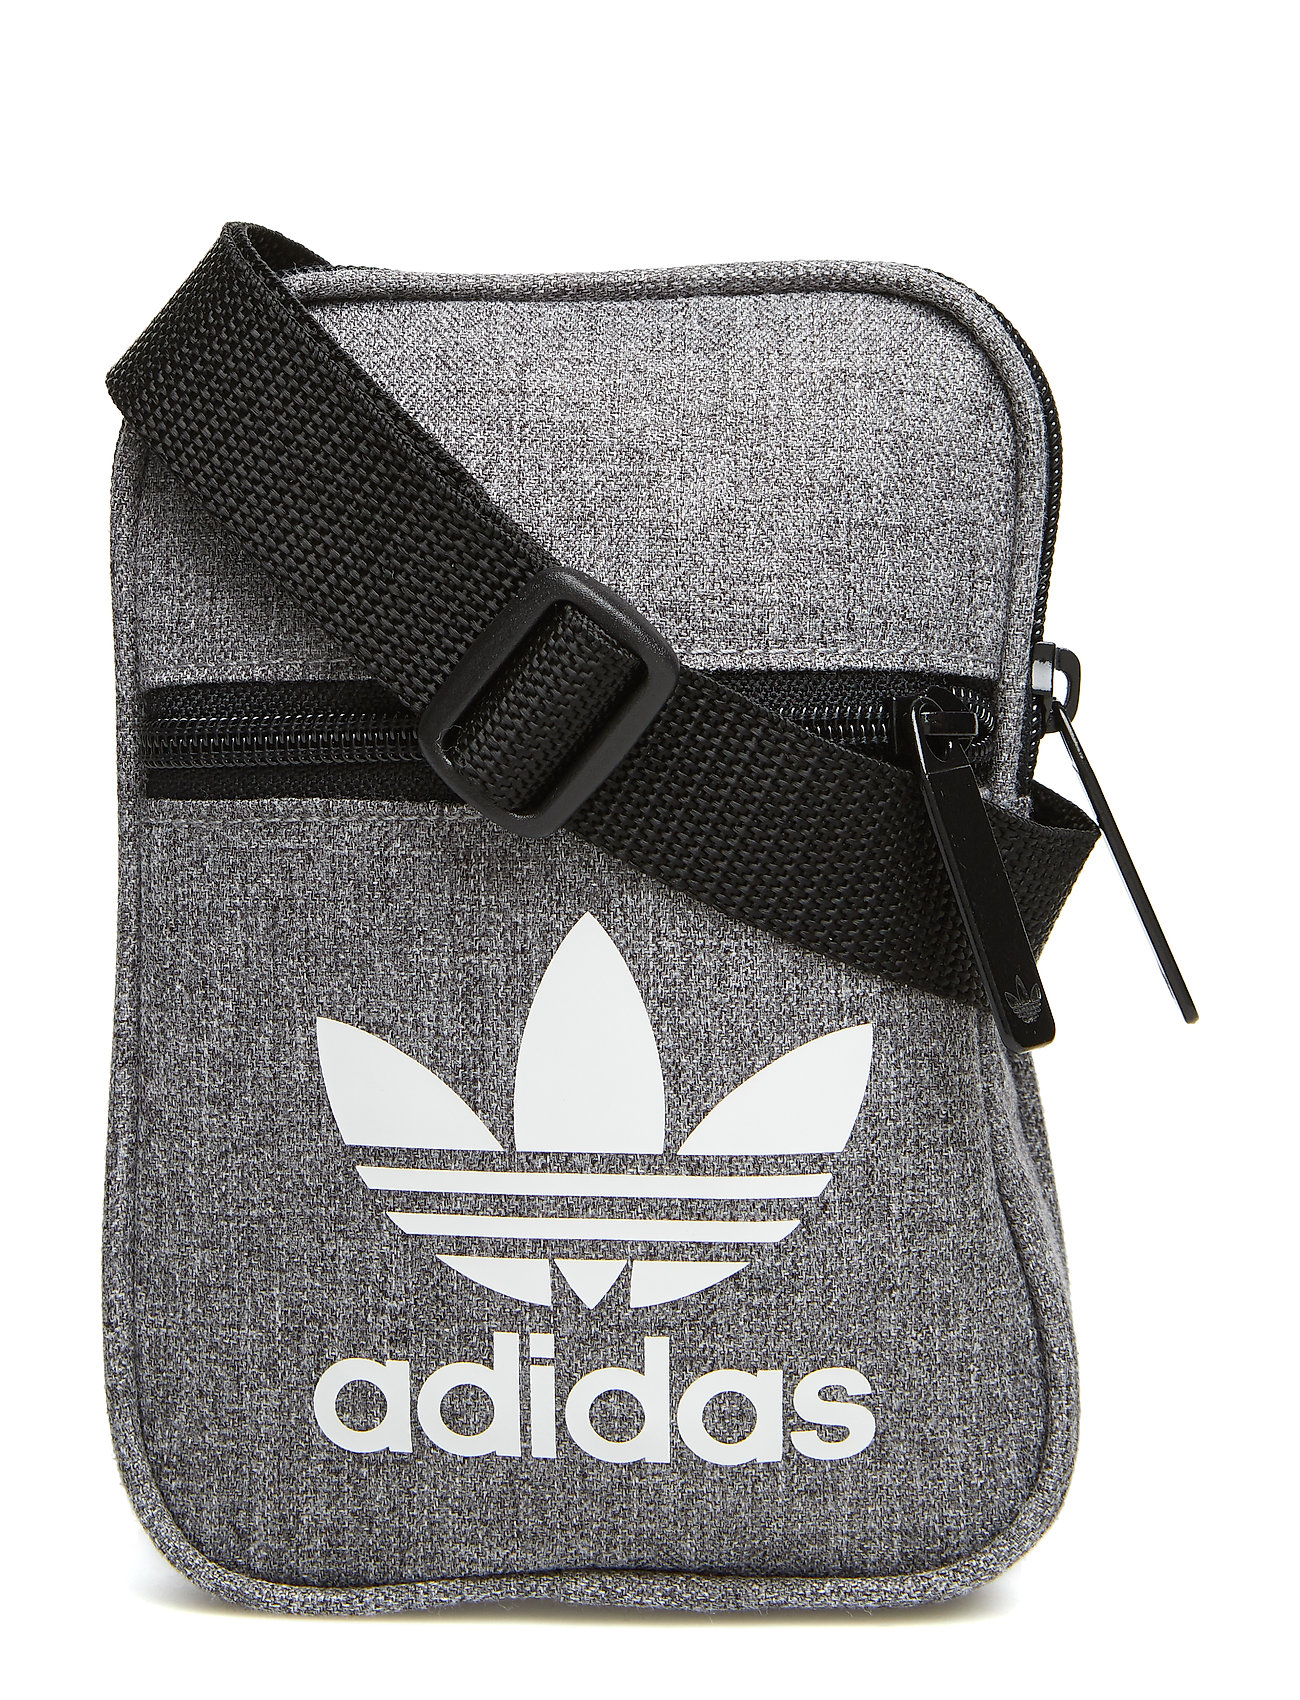 dc092095d37 Fest Bag Casual (Black white) (£17.95) - adidas Originals - Bags ...